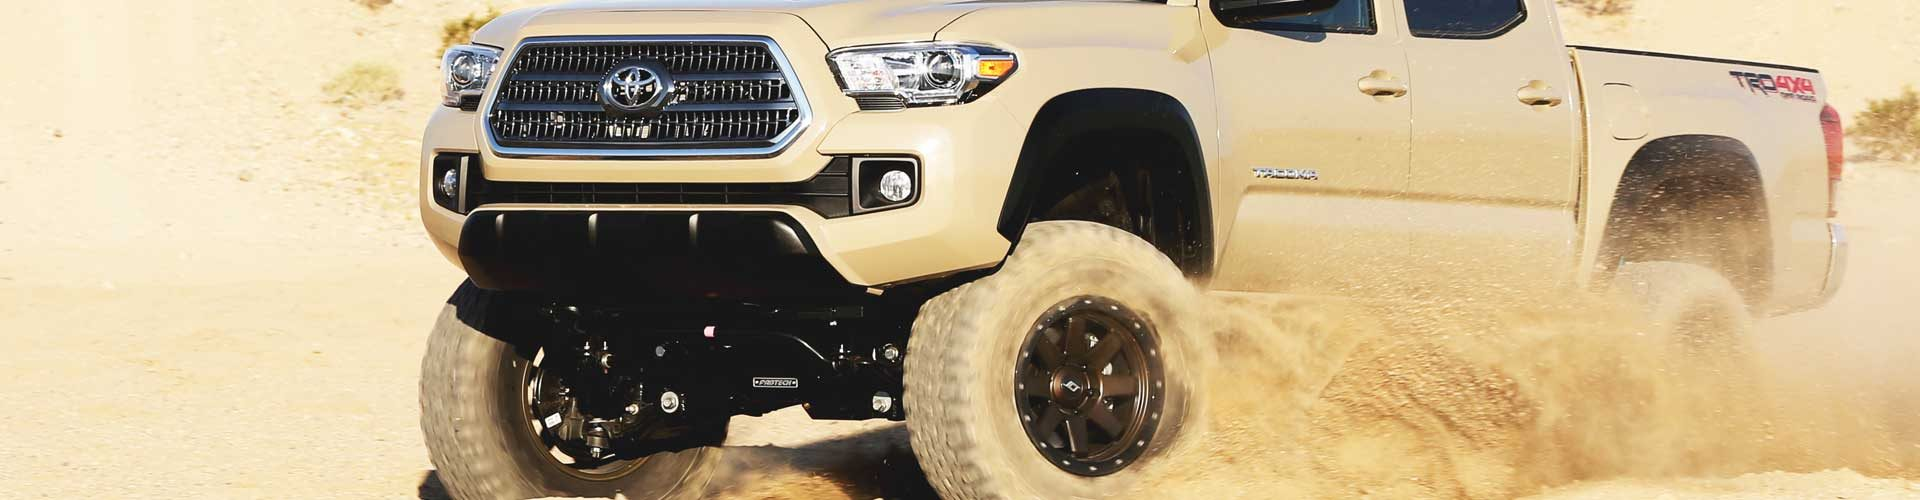 Toyota Tacoma Lift Kits | Fabtech®